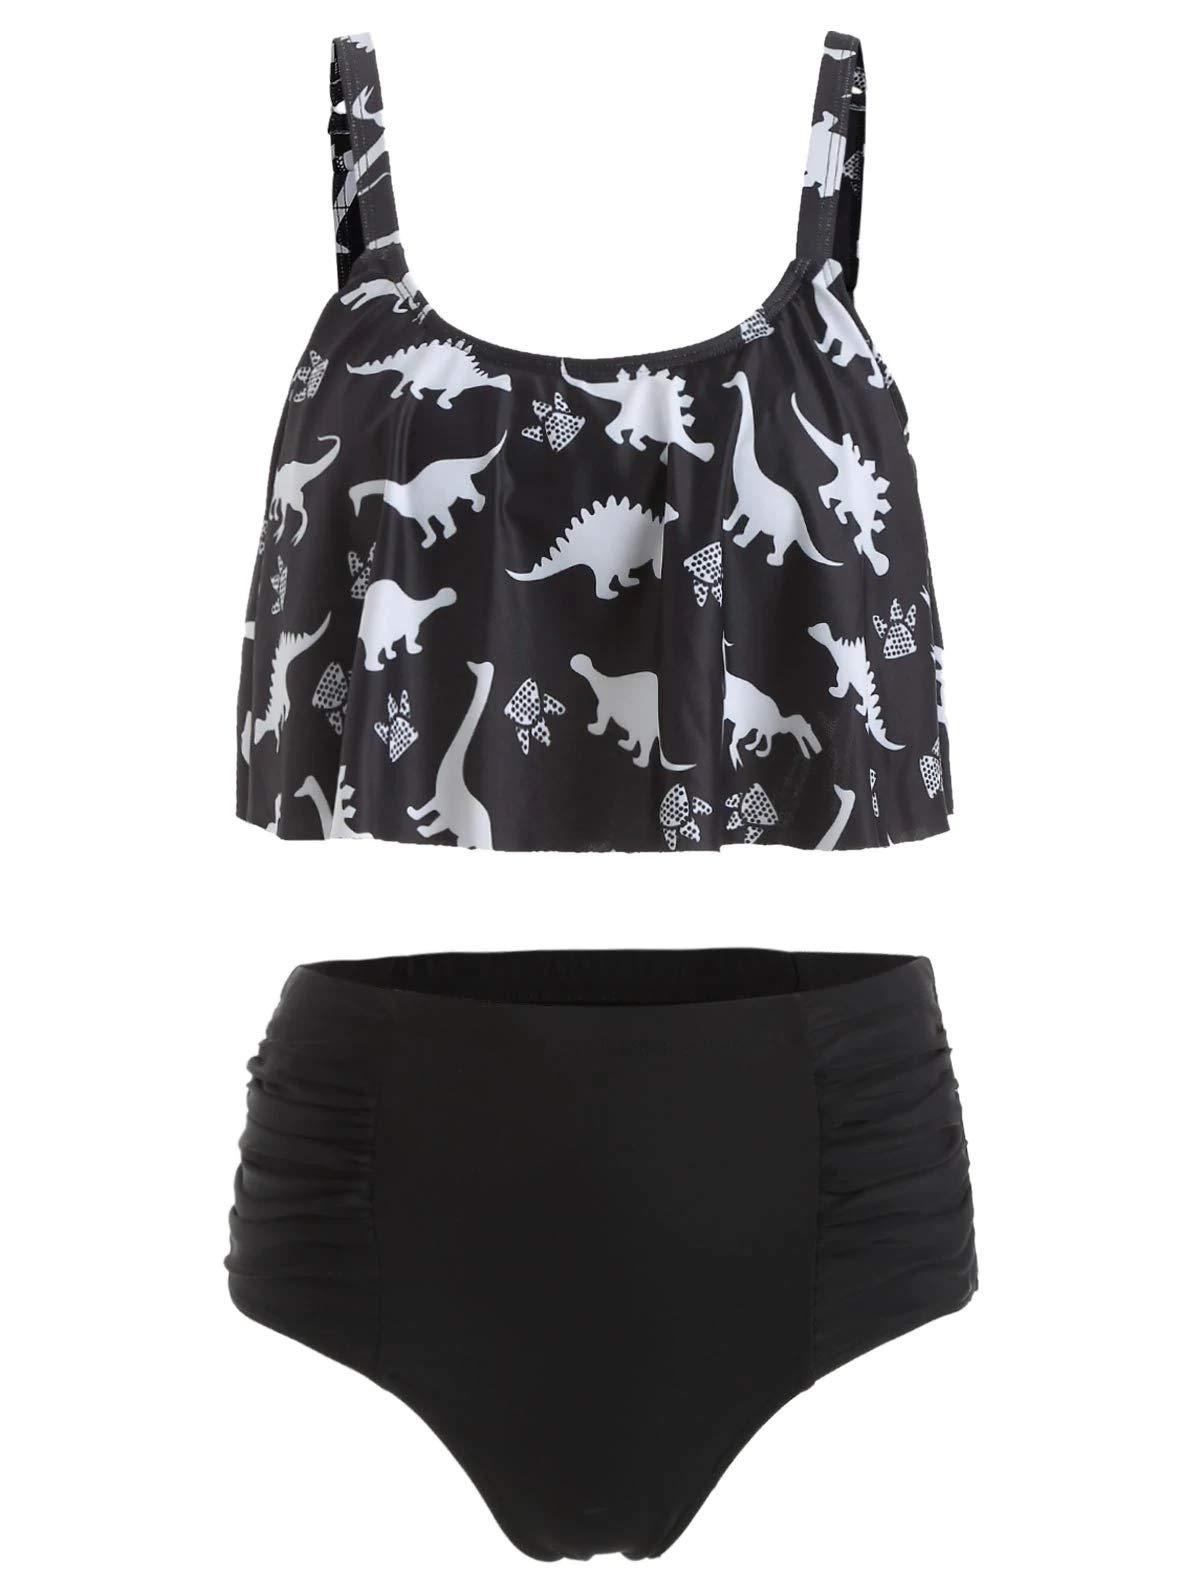 LeaLac Womens Dinosaur Print Straps Ruched High Waisted Bikini Bottom Flounce Swimsuit Set Two Piece Swimsuit Bathing Suit